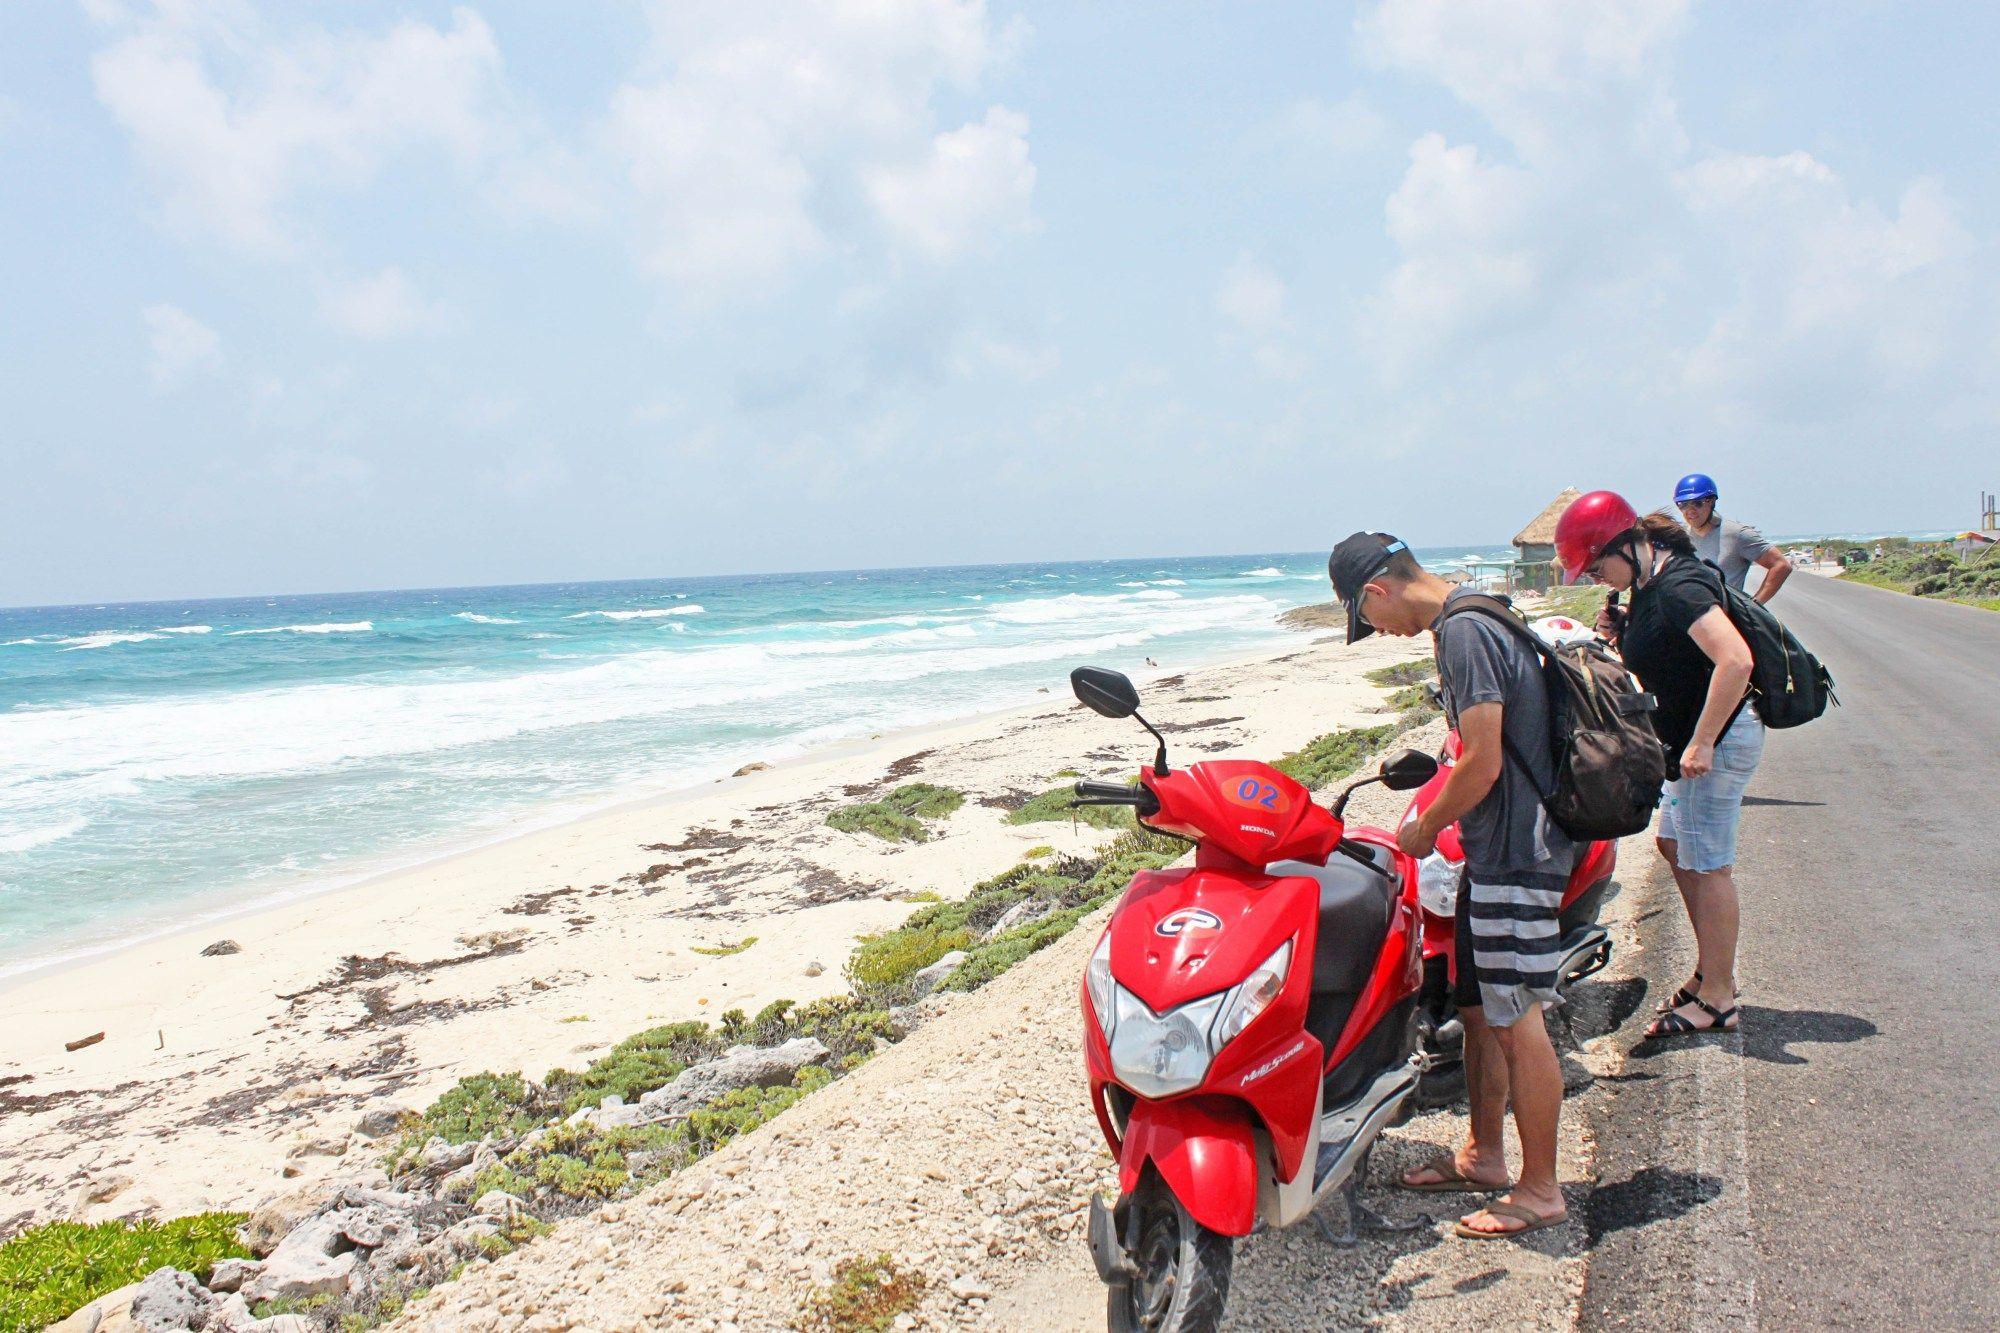 Top 7 Things To Do In Playa Del Carmen Playa Del Carmen Cozumel